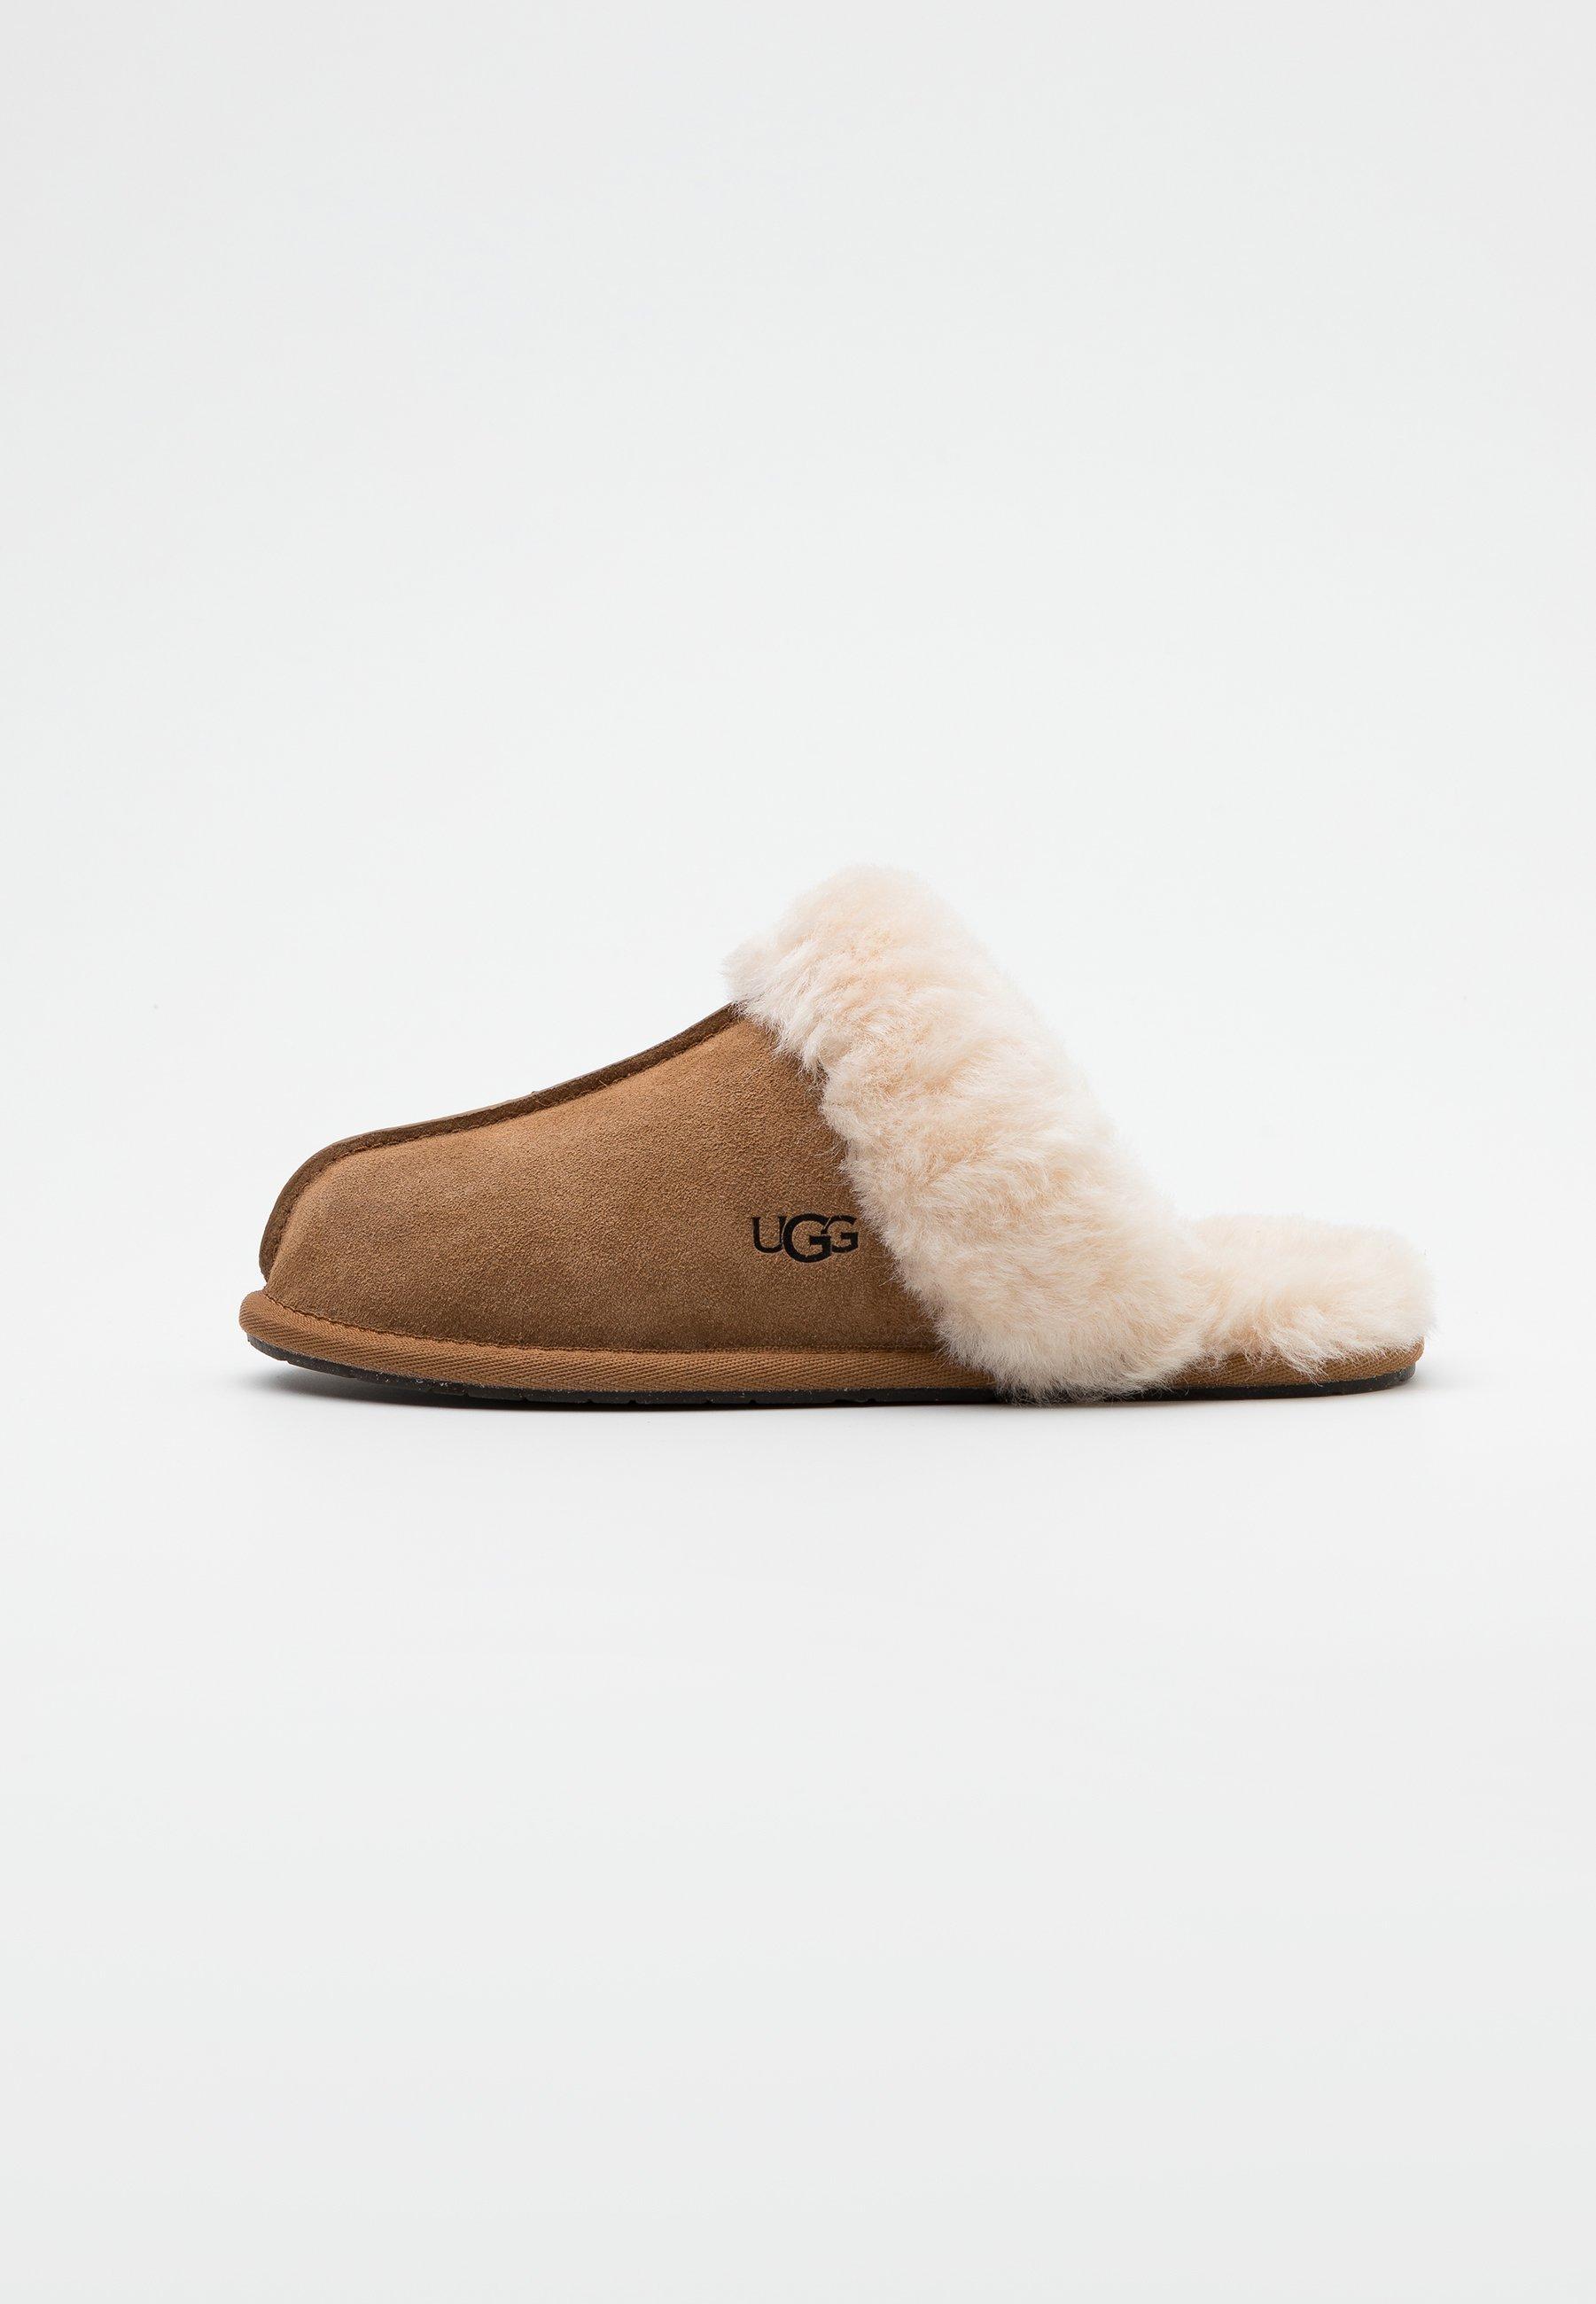 ugg chausson